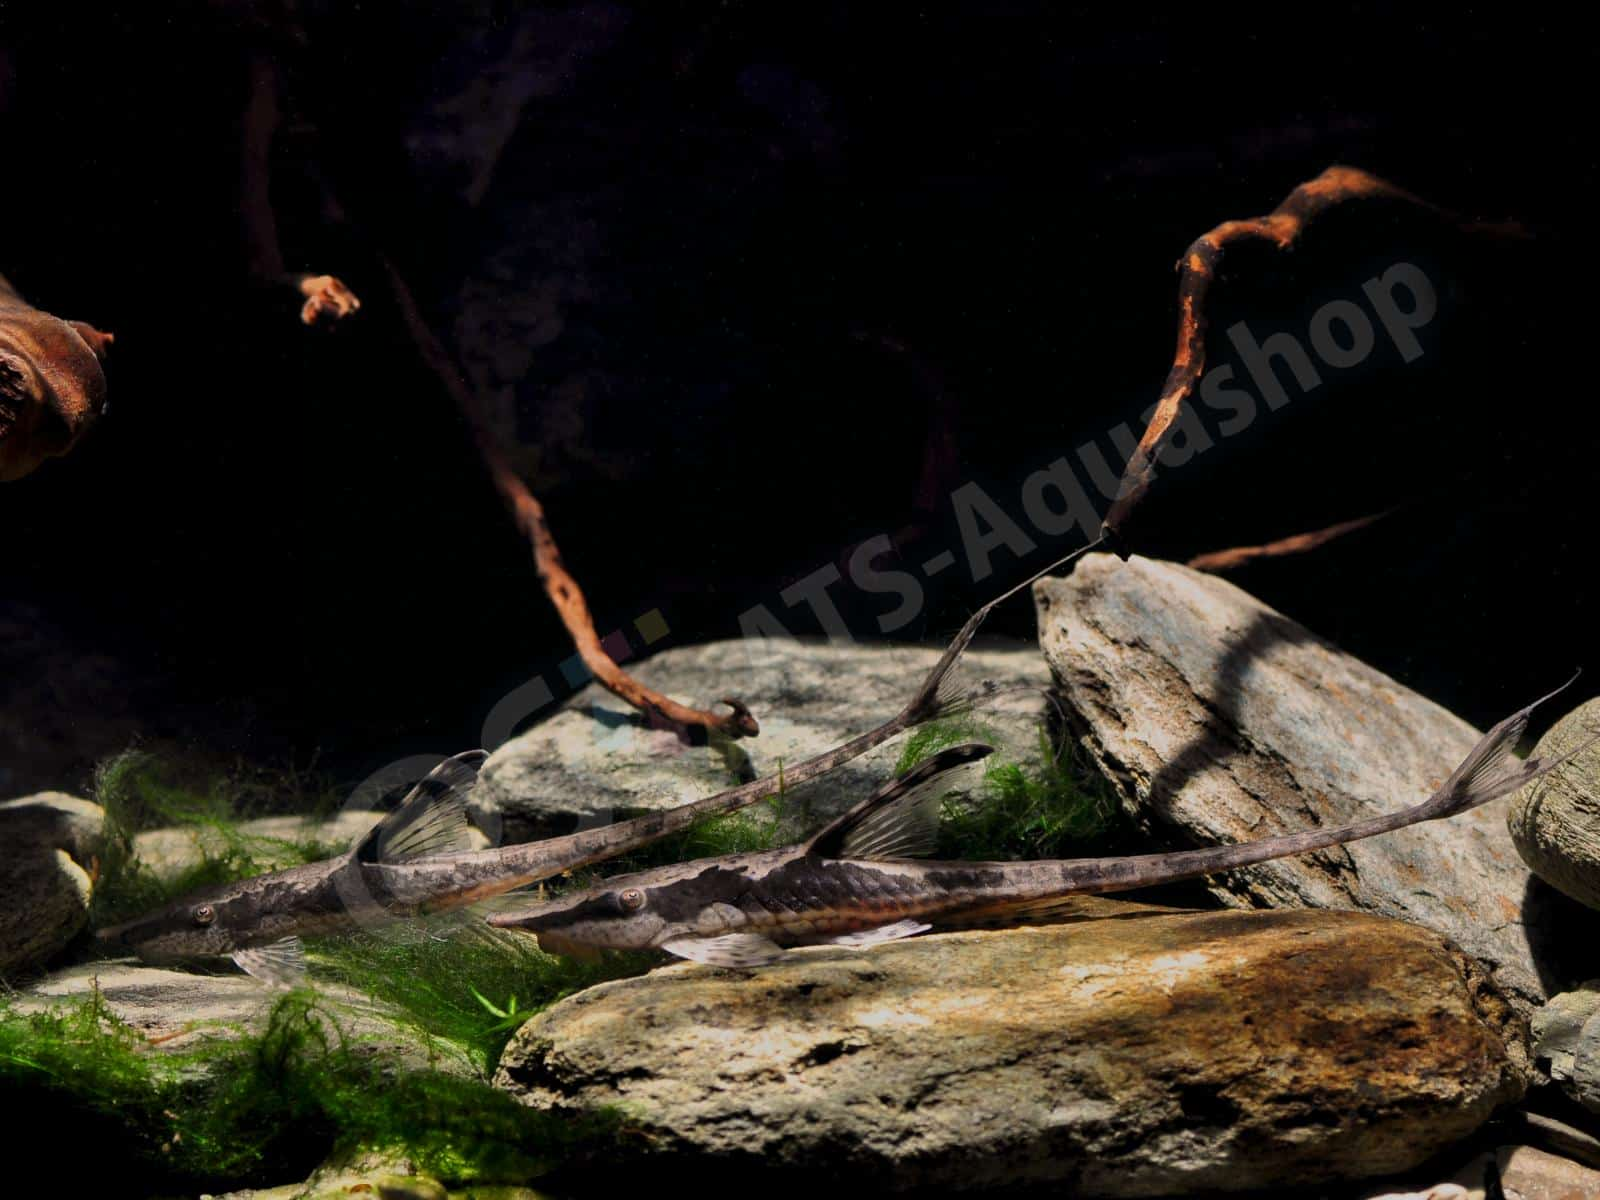 sturisomatichthys aureum enrico richter 0007 7